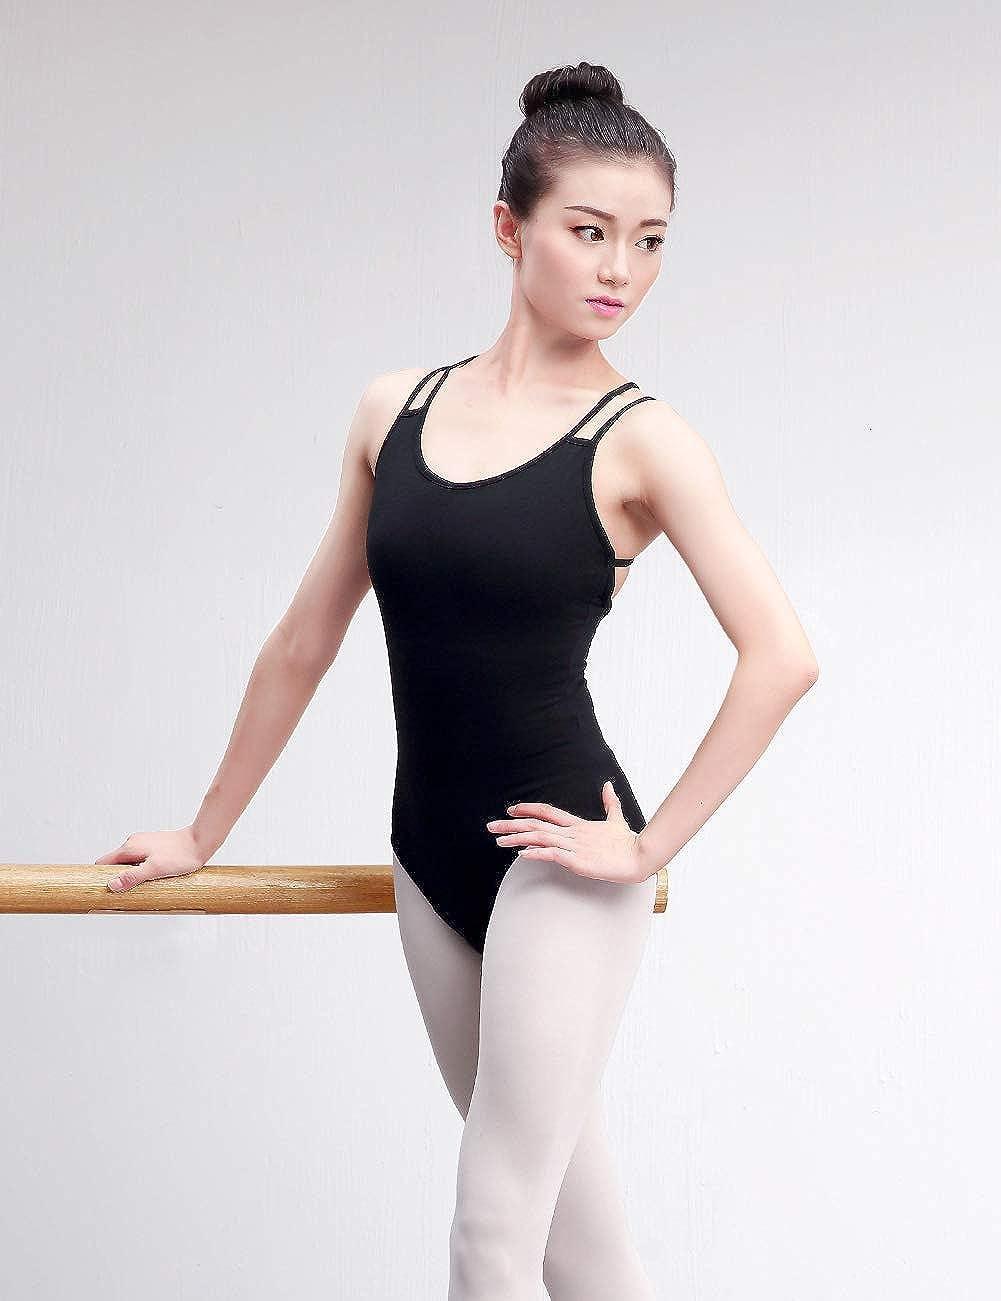 Daydance Camisole Dance Leotards for Women Spaghetti Straps Ballet Costumes